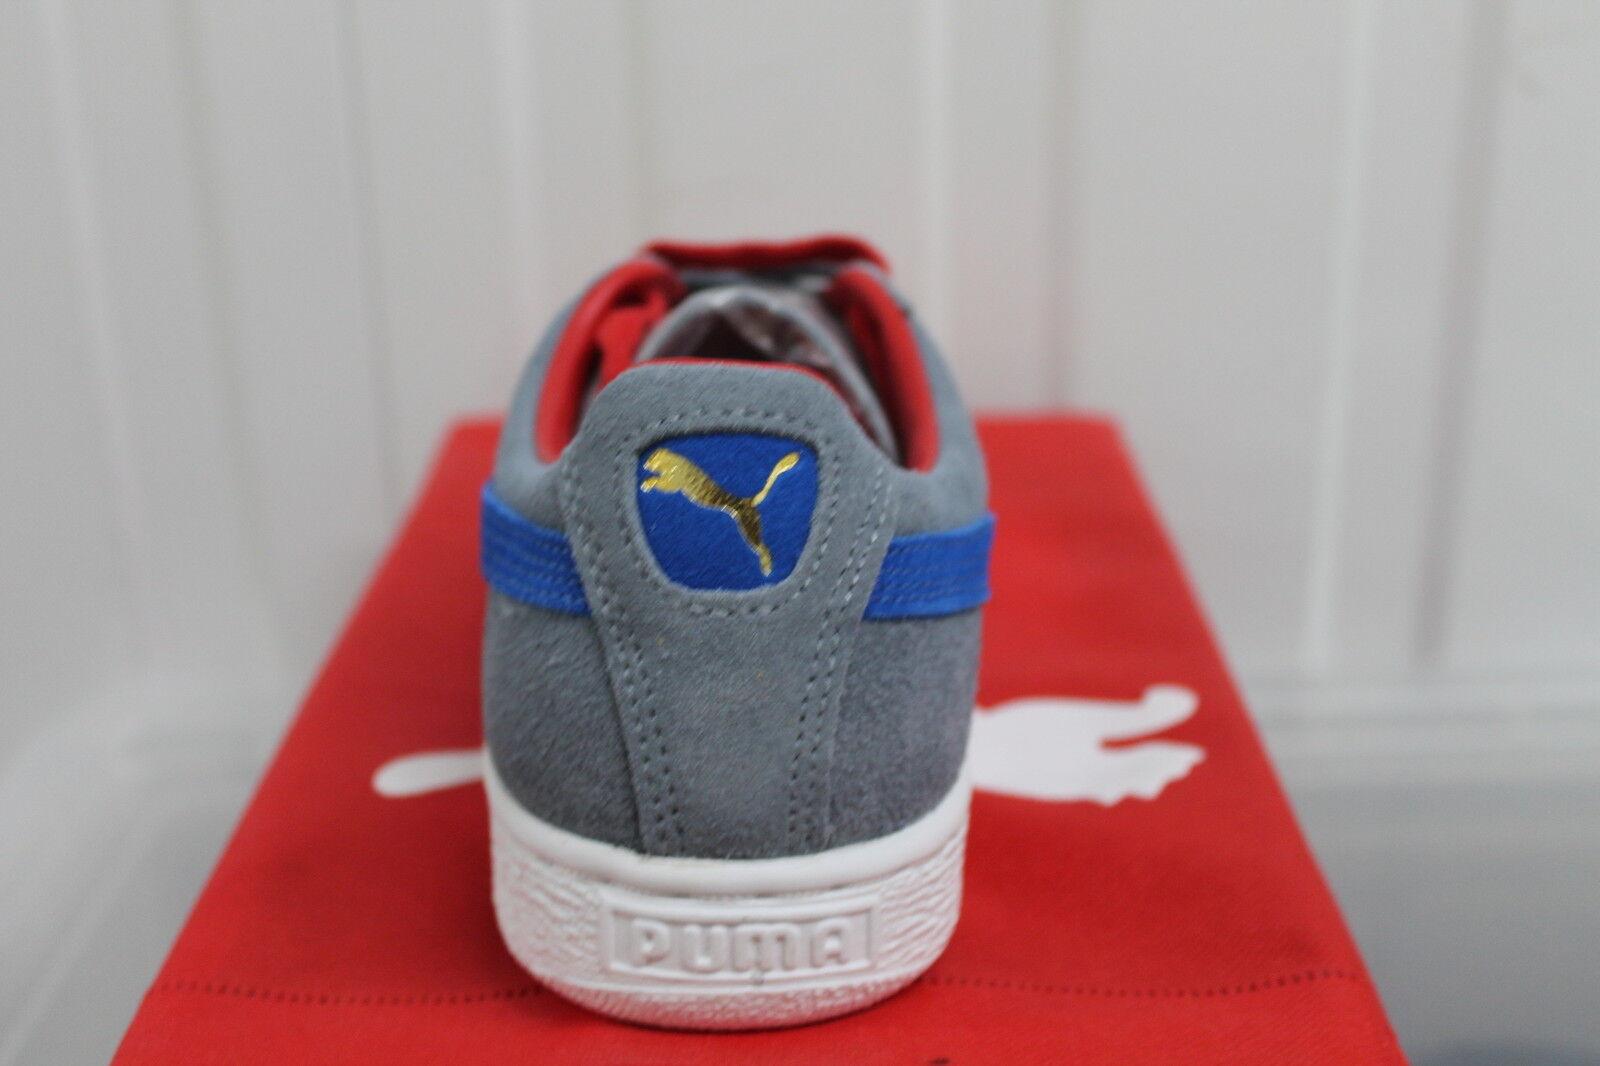 Trainers Puma Sports St Homme Blancblanc S Chaussures Evo IITpR6